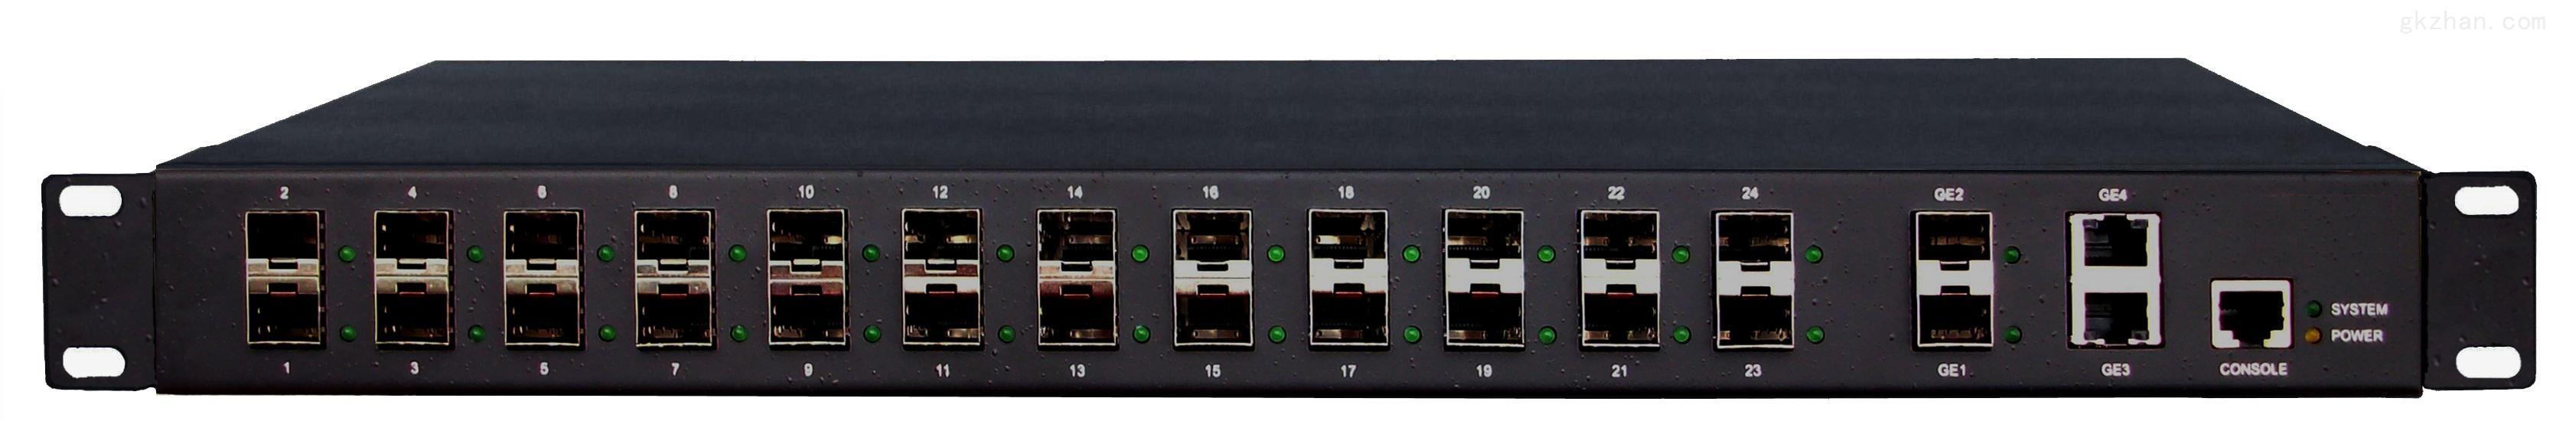 InMax S5326管理型24千兆SFP端口+2千兆combo端口光纤以太网交换机